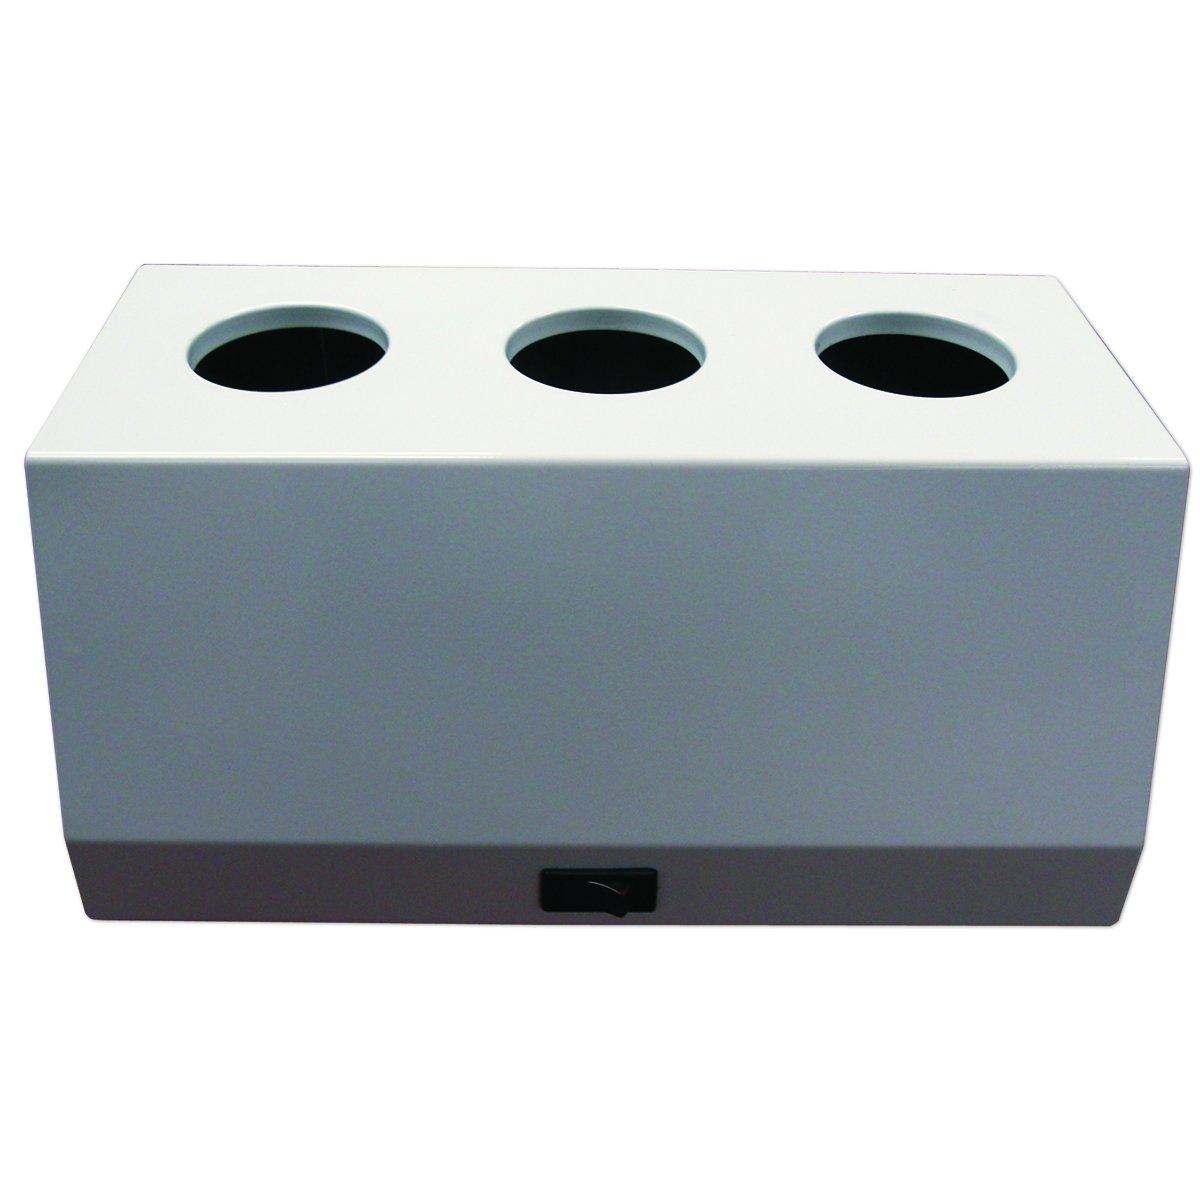 PDC Healthcare UPL-40 Ultrasound Gel Warmer, Holds 3 Bottles, 110V, White (Pack of 1)